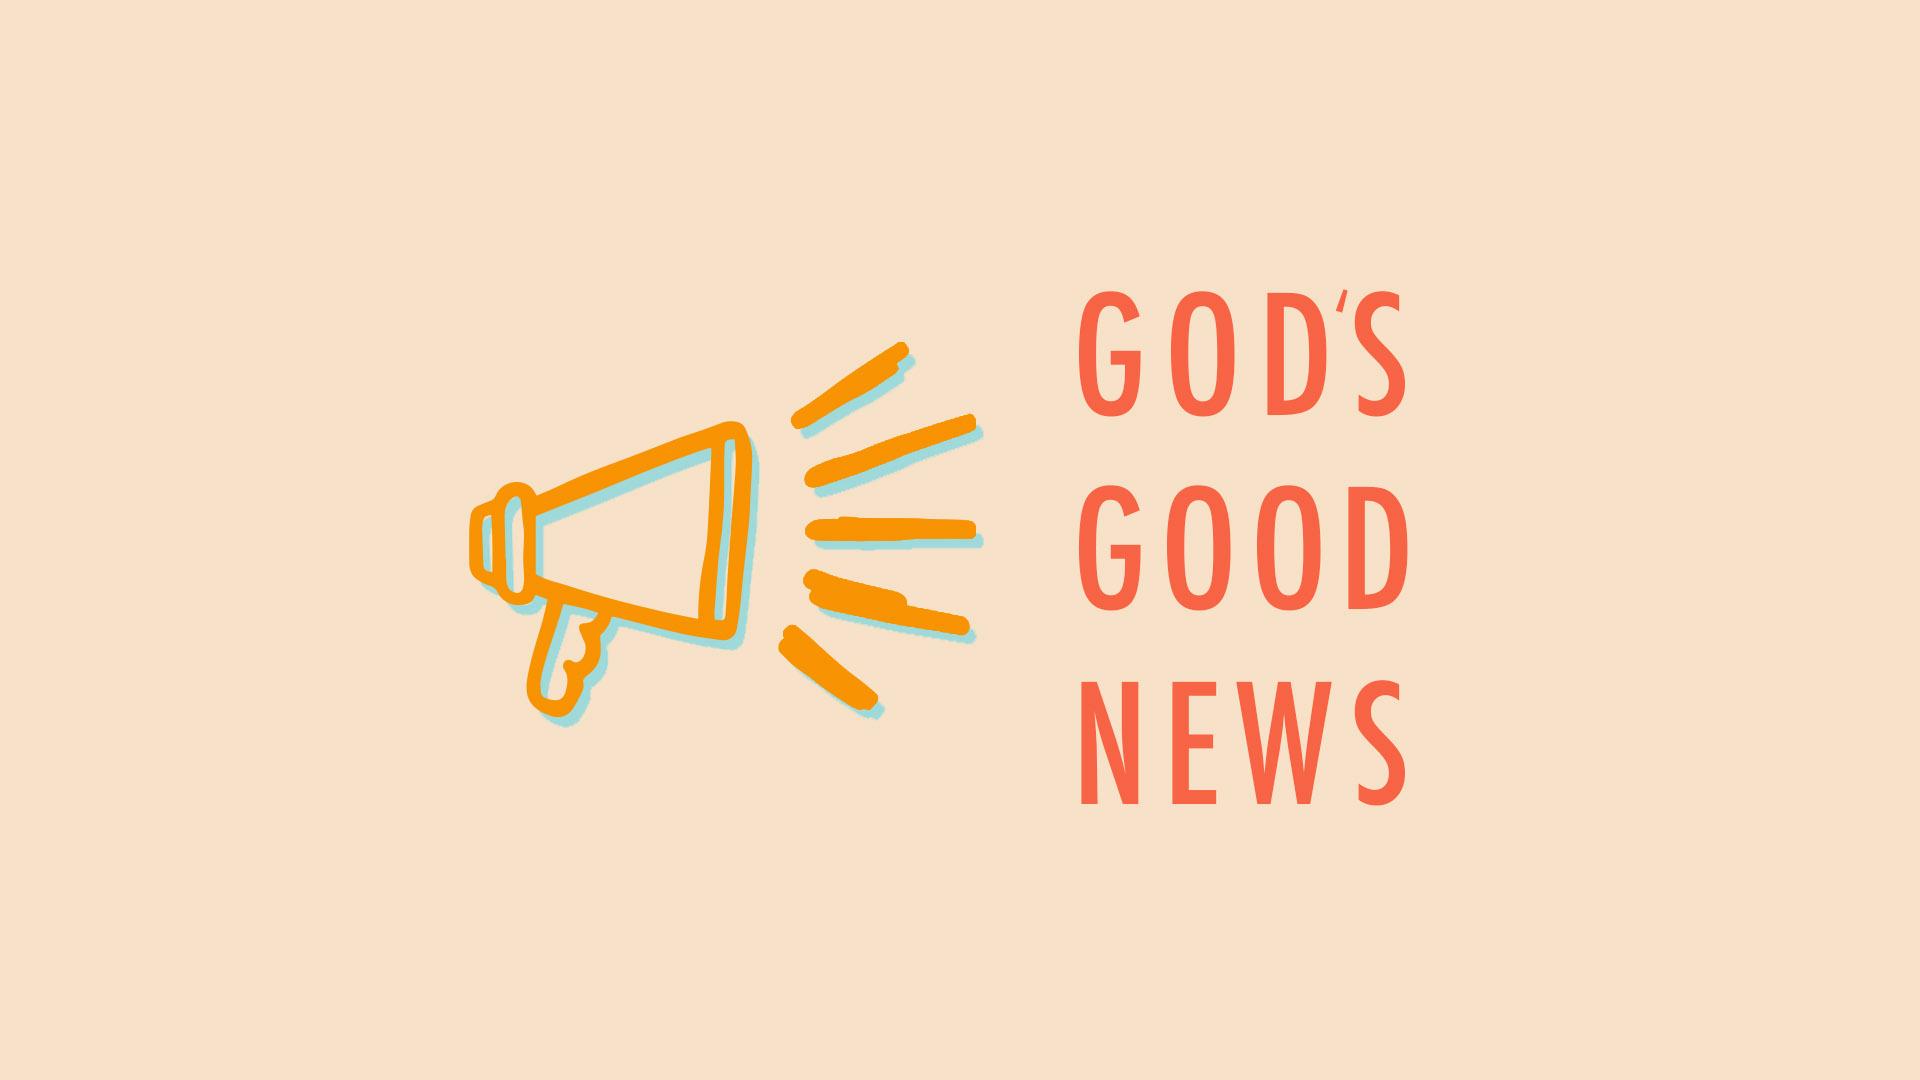 st-johns-harborne-sermon-series-gods-good-news-web.jpg